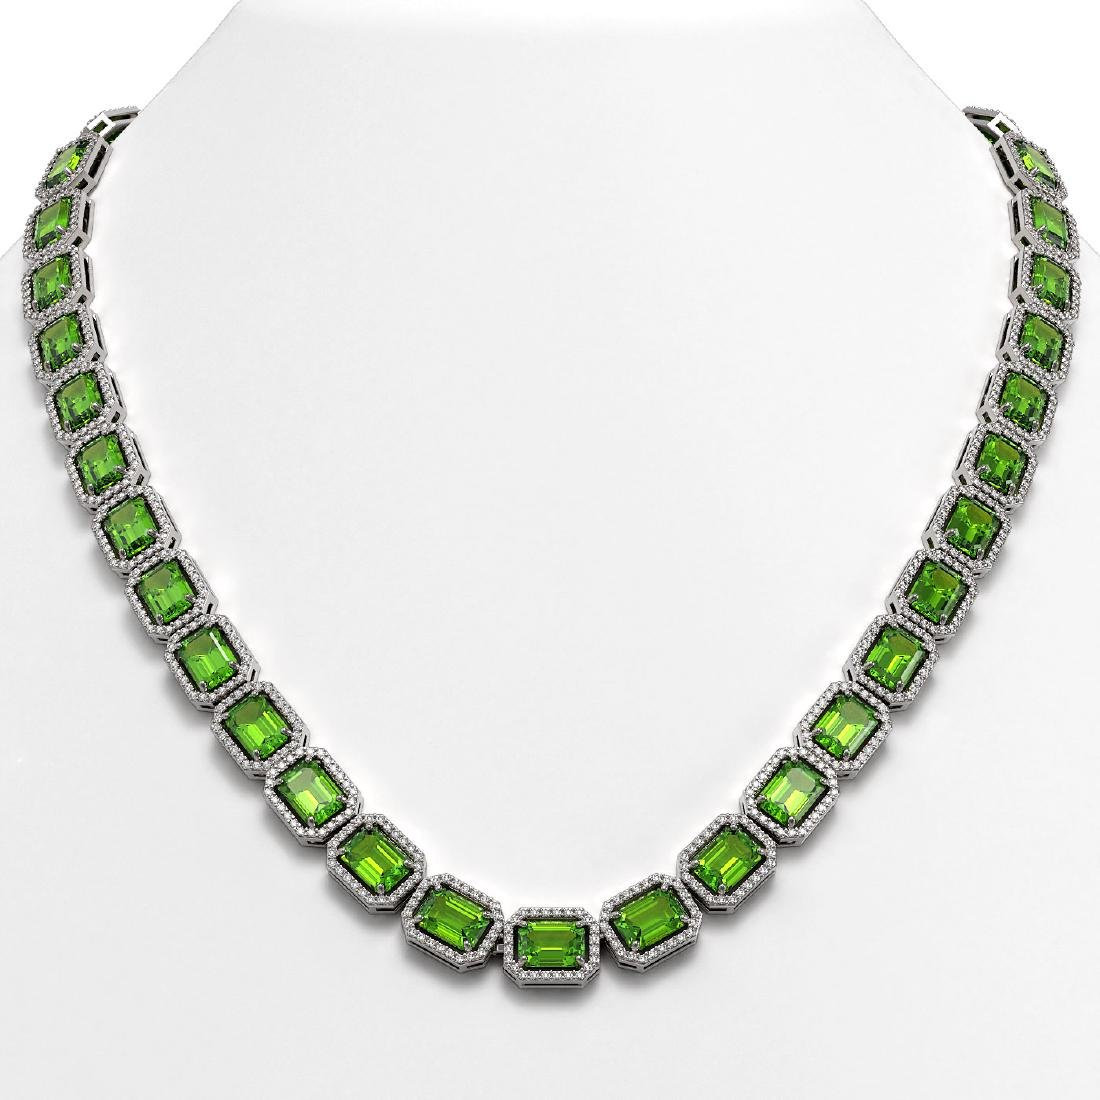 57.3 CTW Peridot & Diamond Halo Necklace 10K White Gold